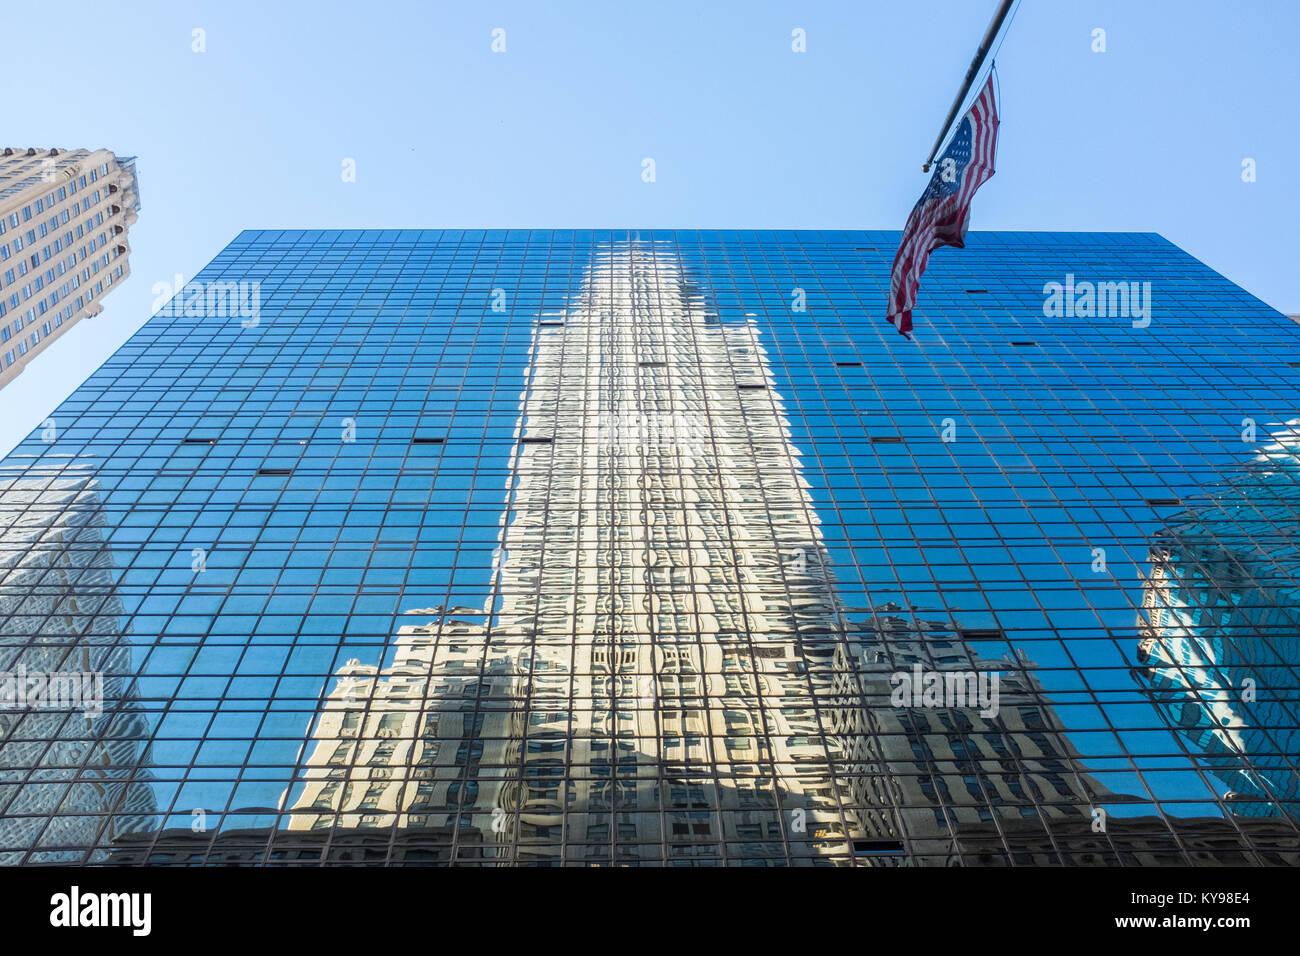 The Chrysler Building, Midtown Manhattan, New York City, USA - Stock Image